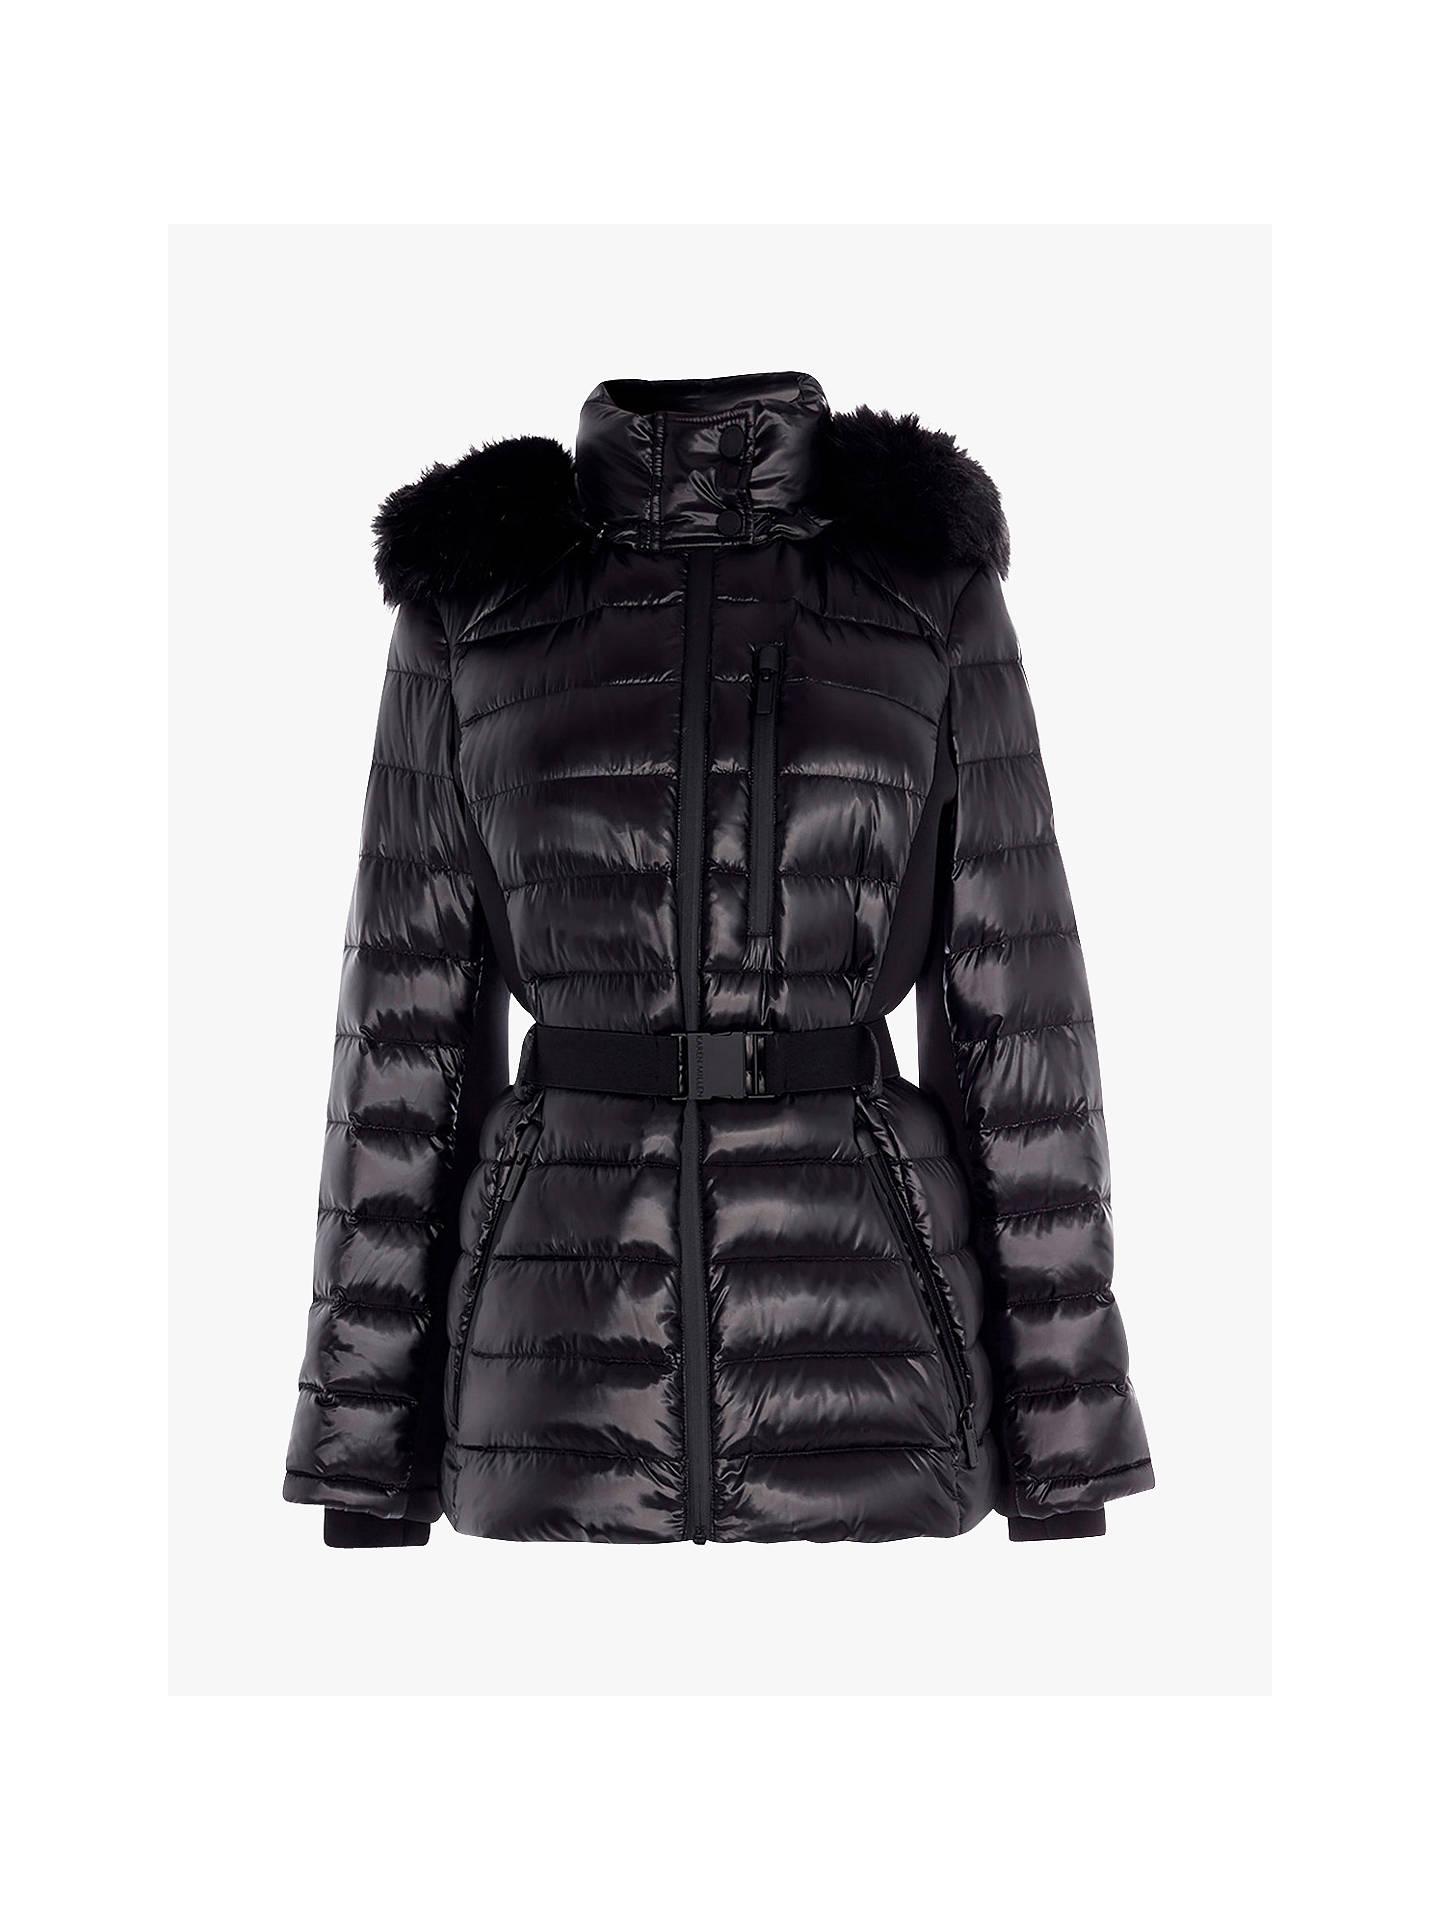 2ba864a45 Karen Millen Belted Puffer Jacket, Black at John Lewis & Partners